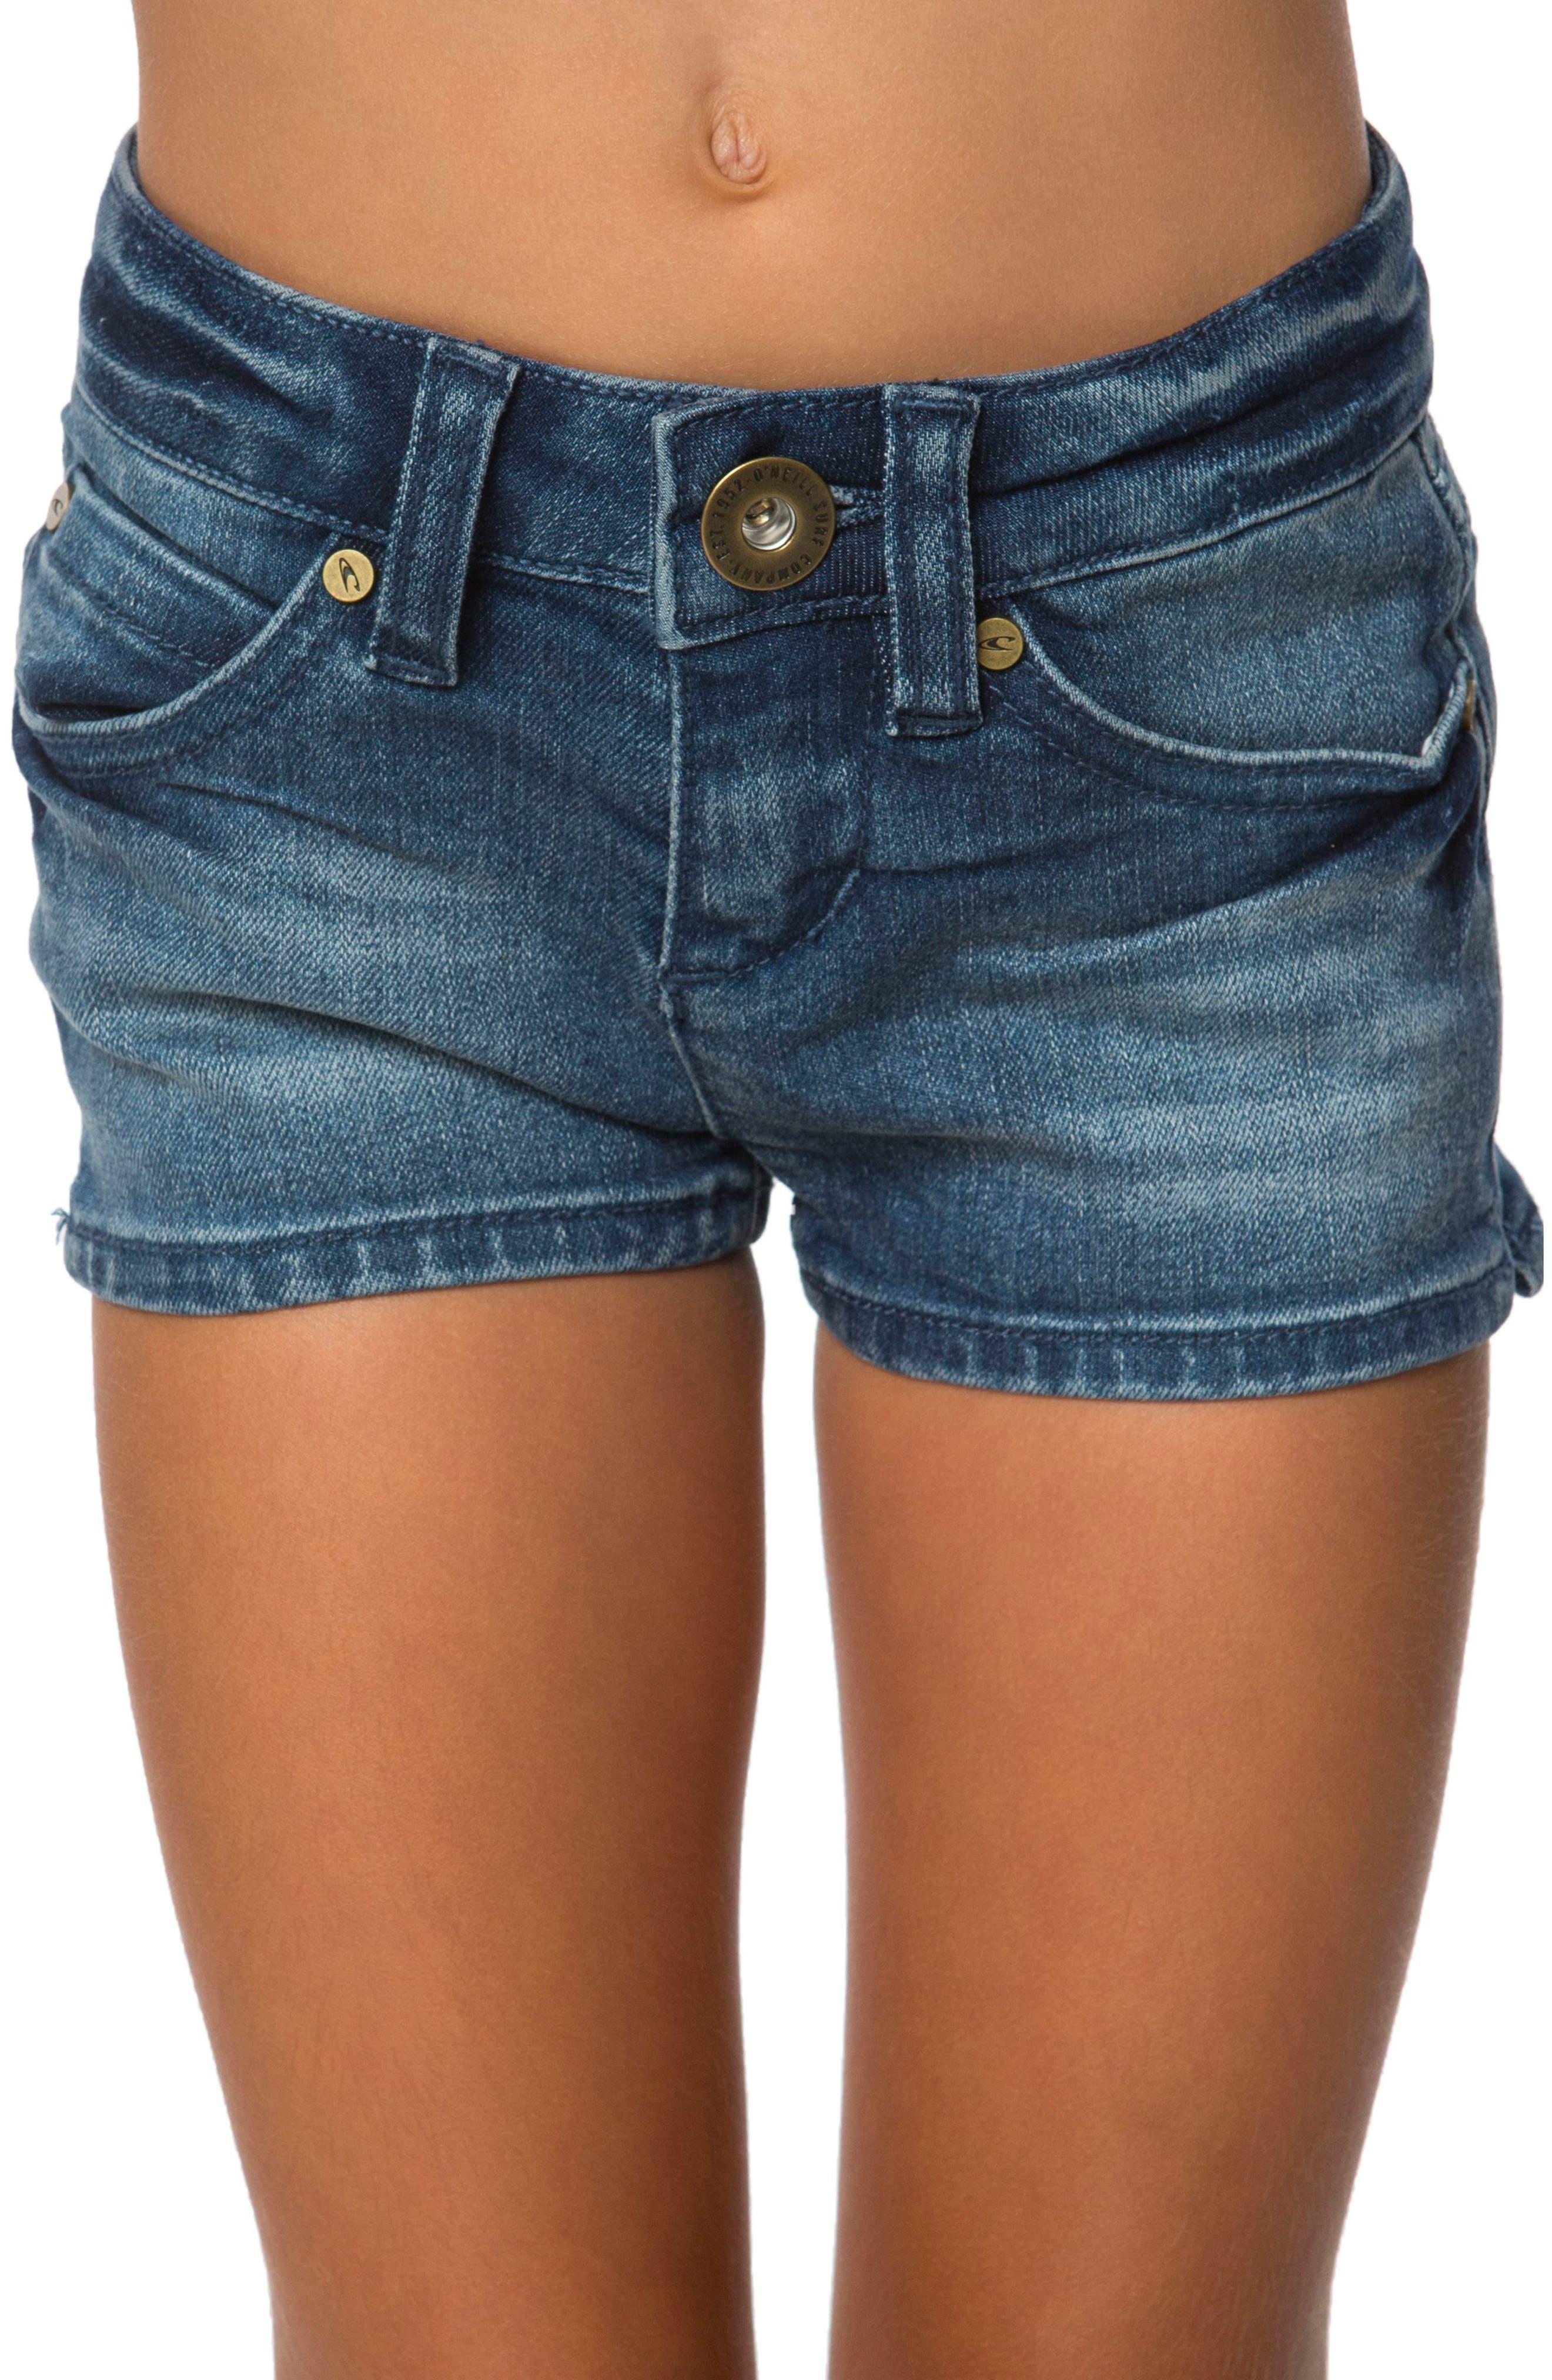 Minnie Denim Shorts,                         Main,                         color, Mystic Was